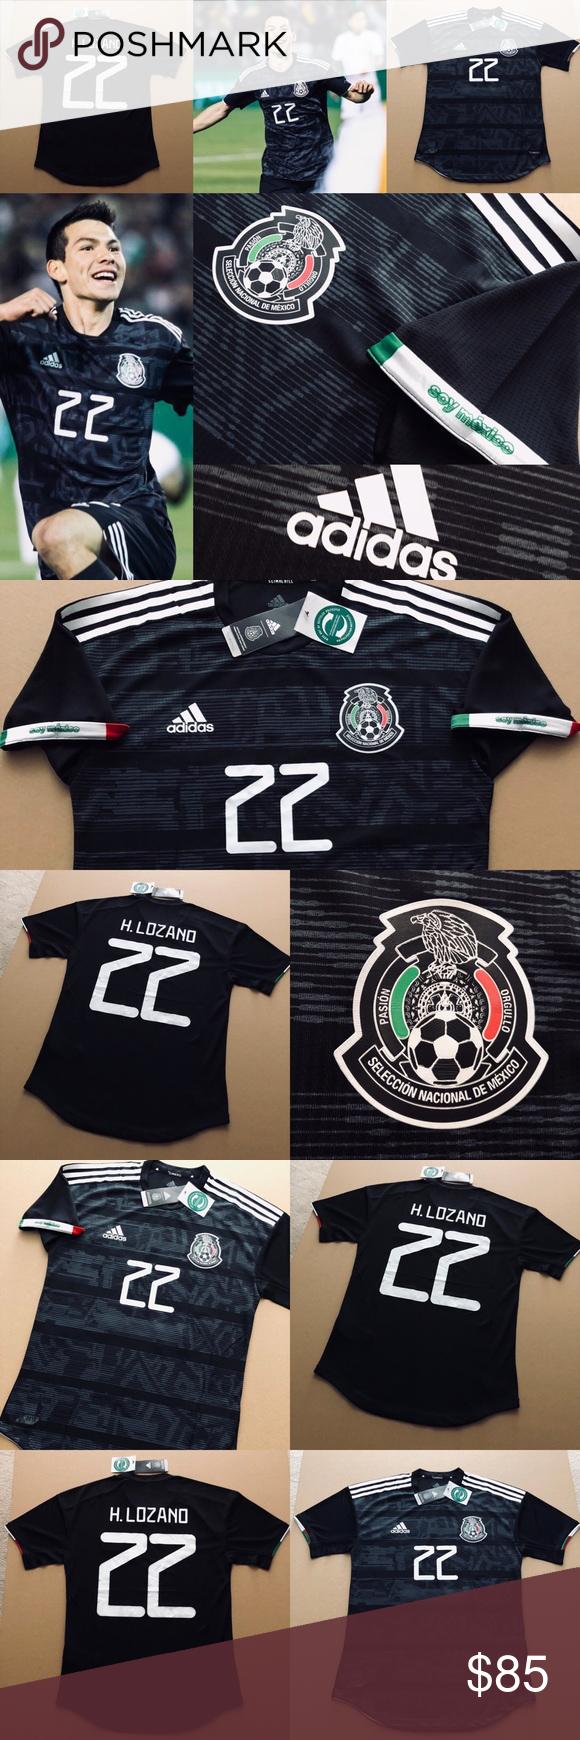 detailed look 6a2bf a80b1 2019 MEXICO Hirving Lozano 22 Soccer Jersey CHUCKY 2019 ...